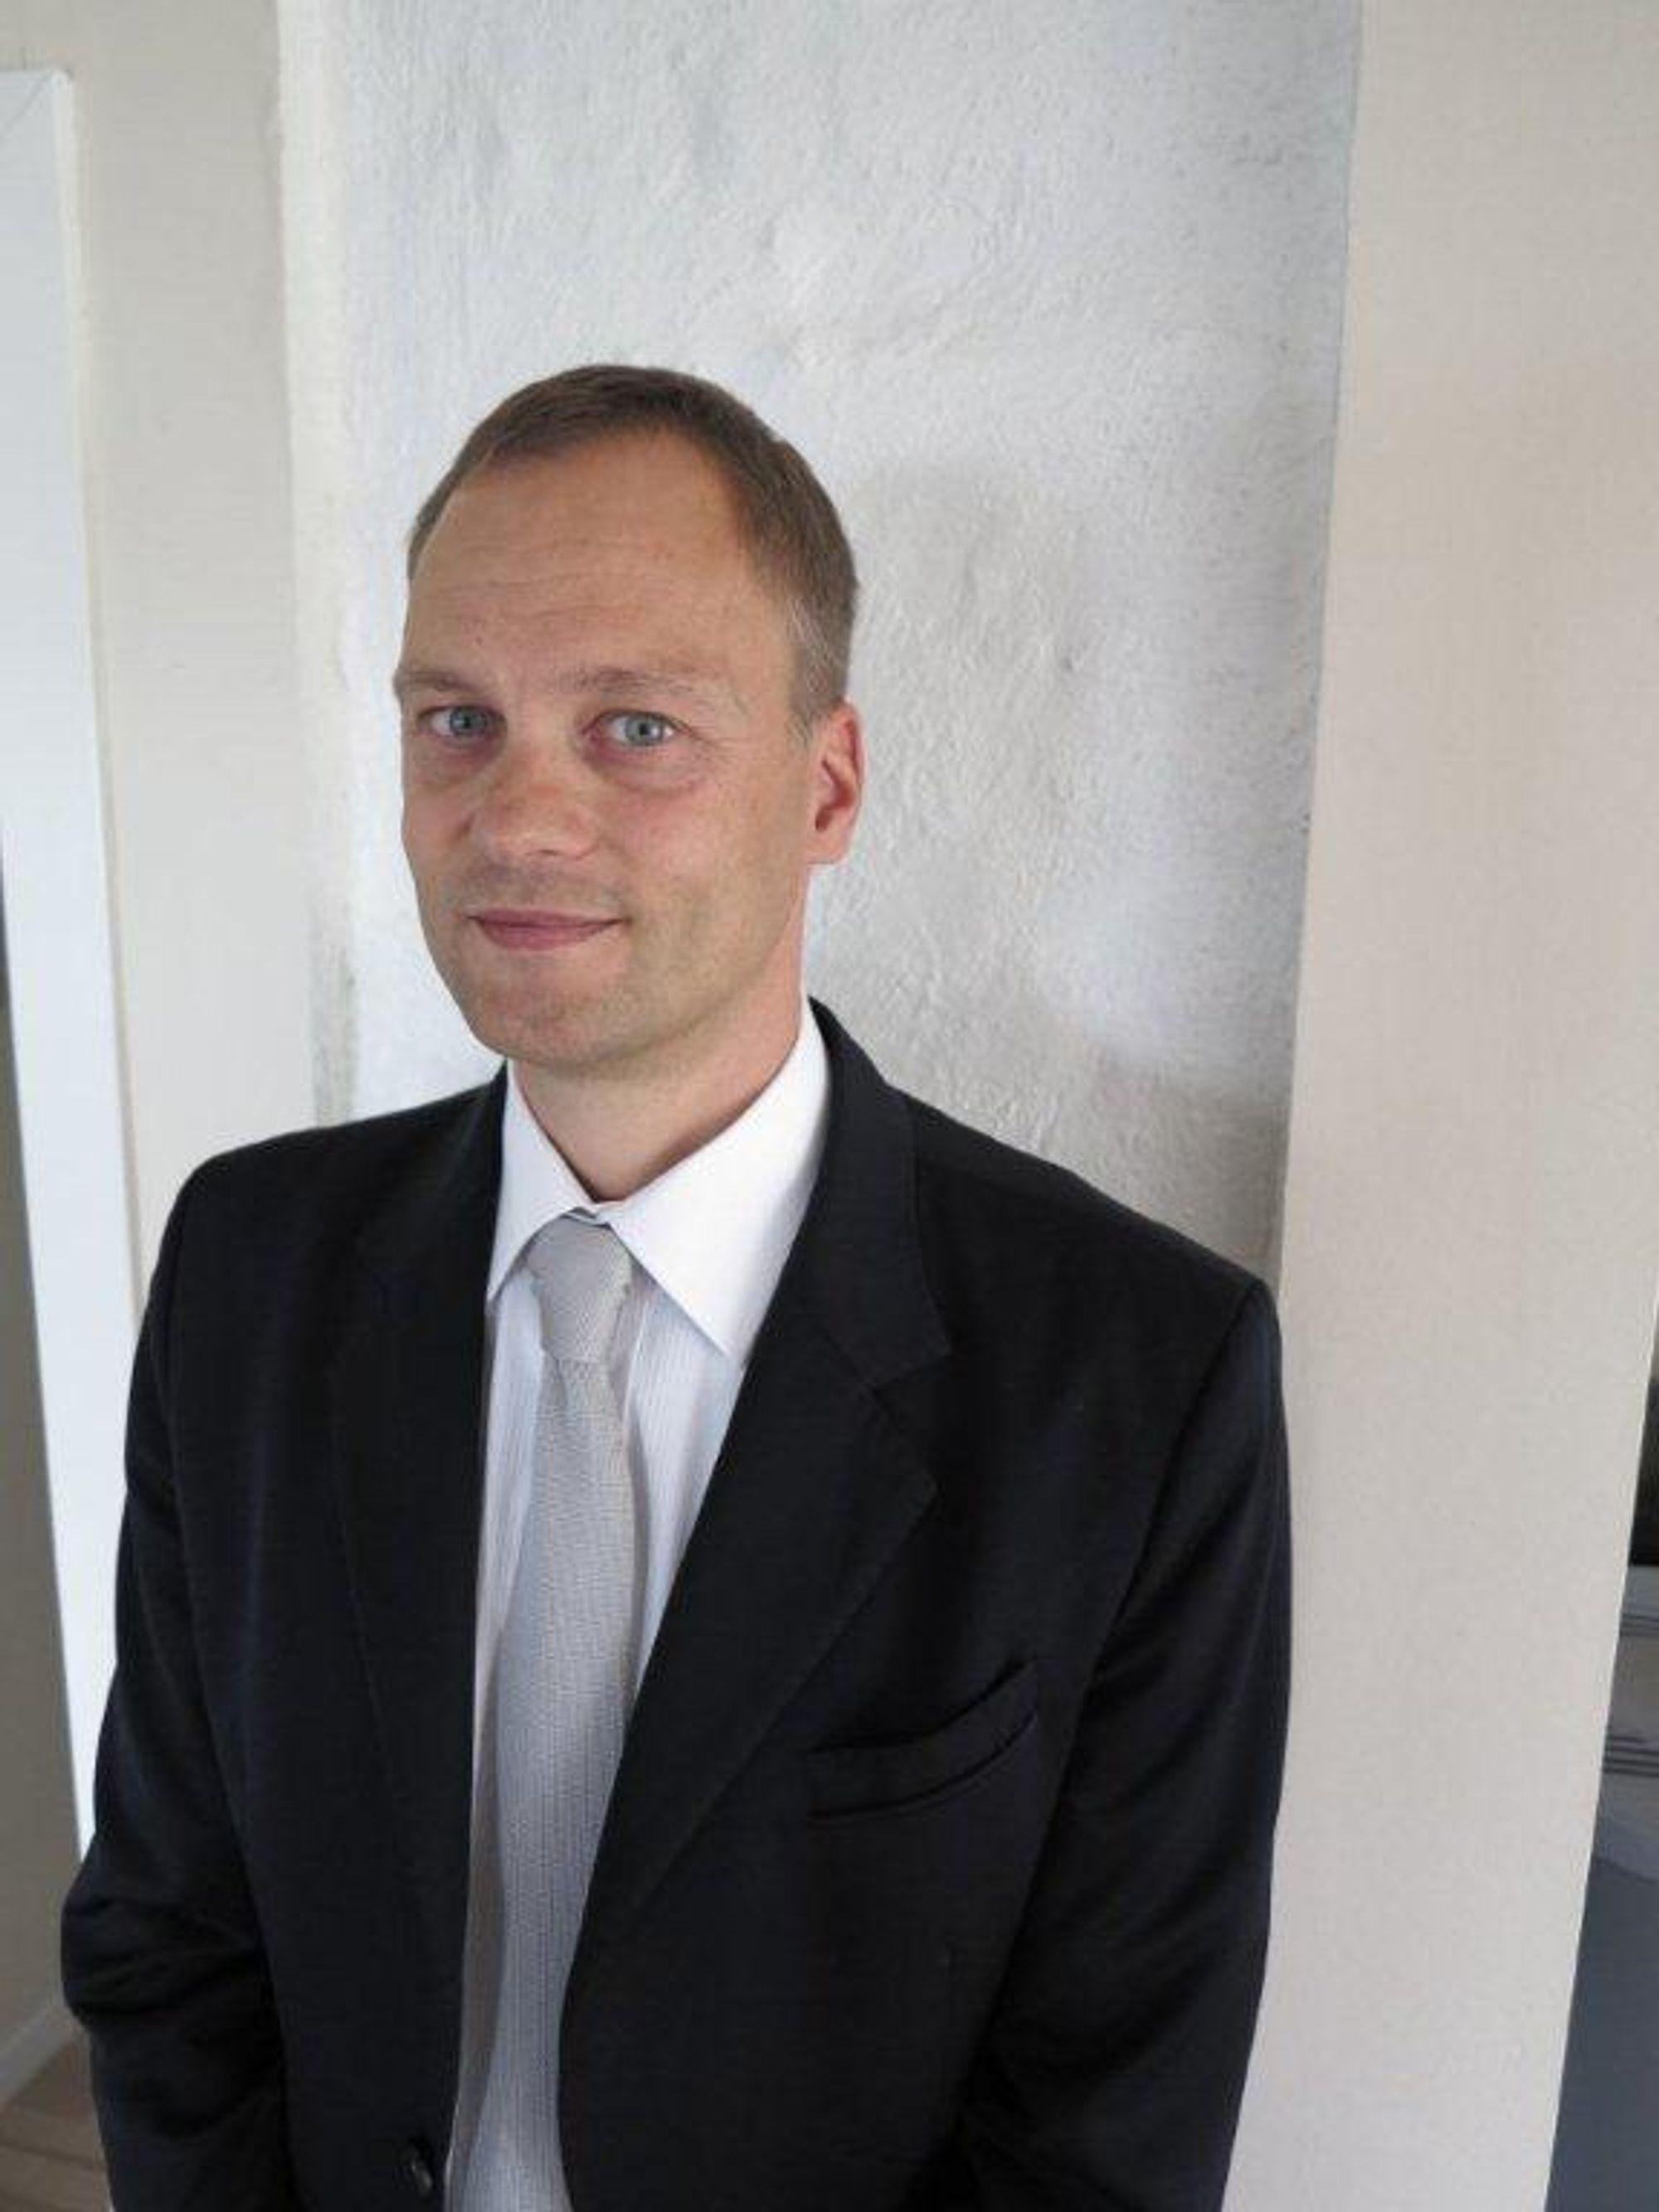 Lars Torstveit skal bygge opp en stor marine-, olje- og gassavdeling hos Schneider Electric Norge.